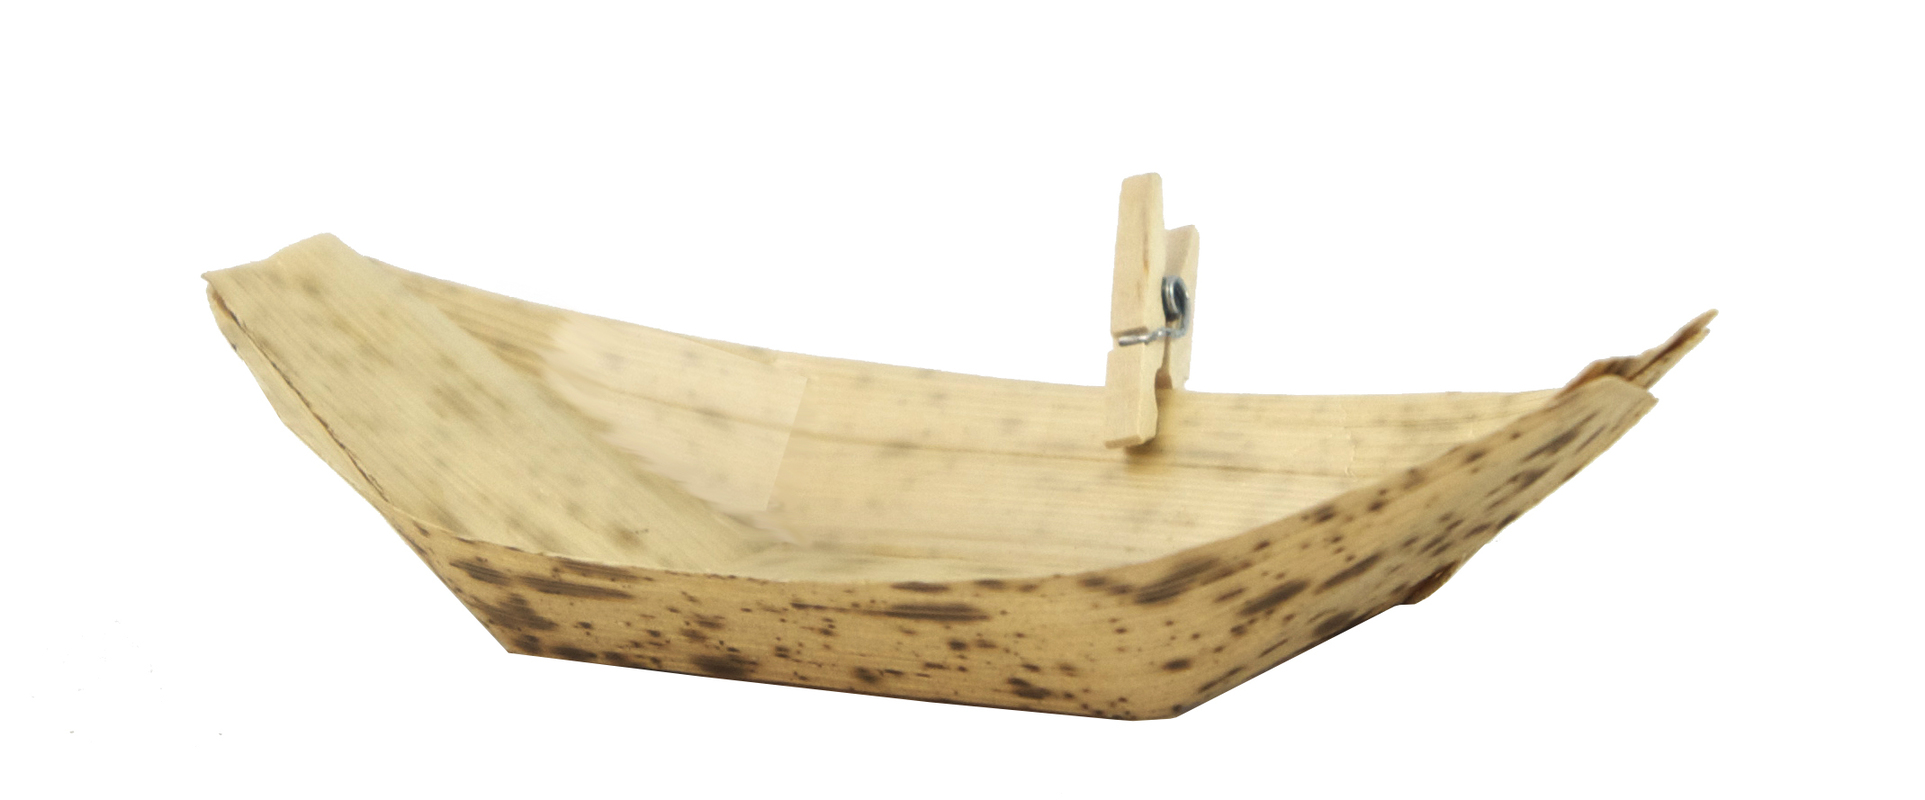 Bamboo Leaf Boat 1.5 oz - 3.7 x 2.1 x 0.6 in